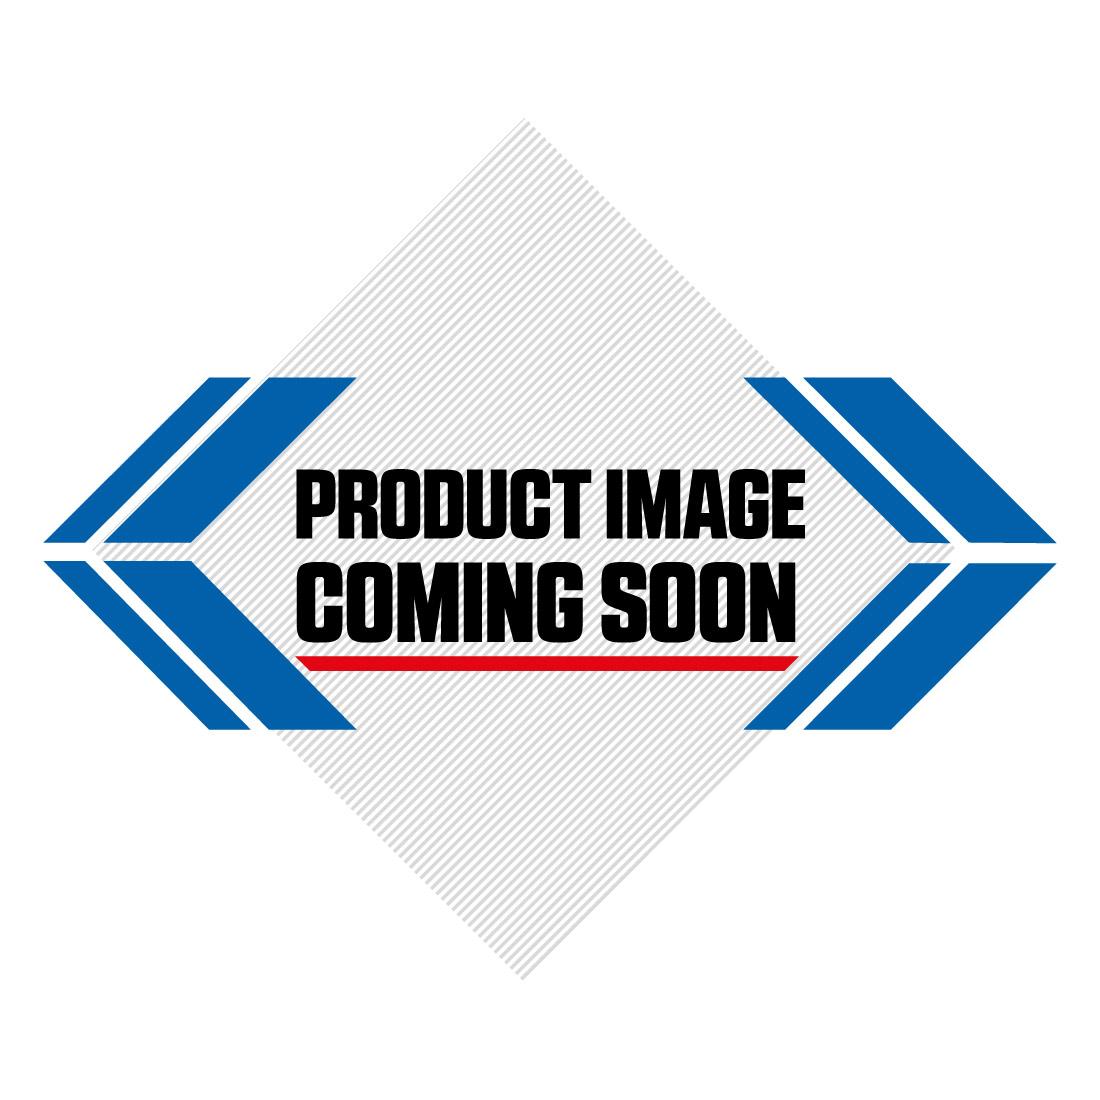 Renthal Twinring Rear Sprocket Kawasaki KX KXF KDX KLX Suzuki RMZ - Green Image-4>